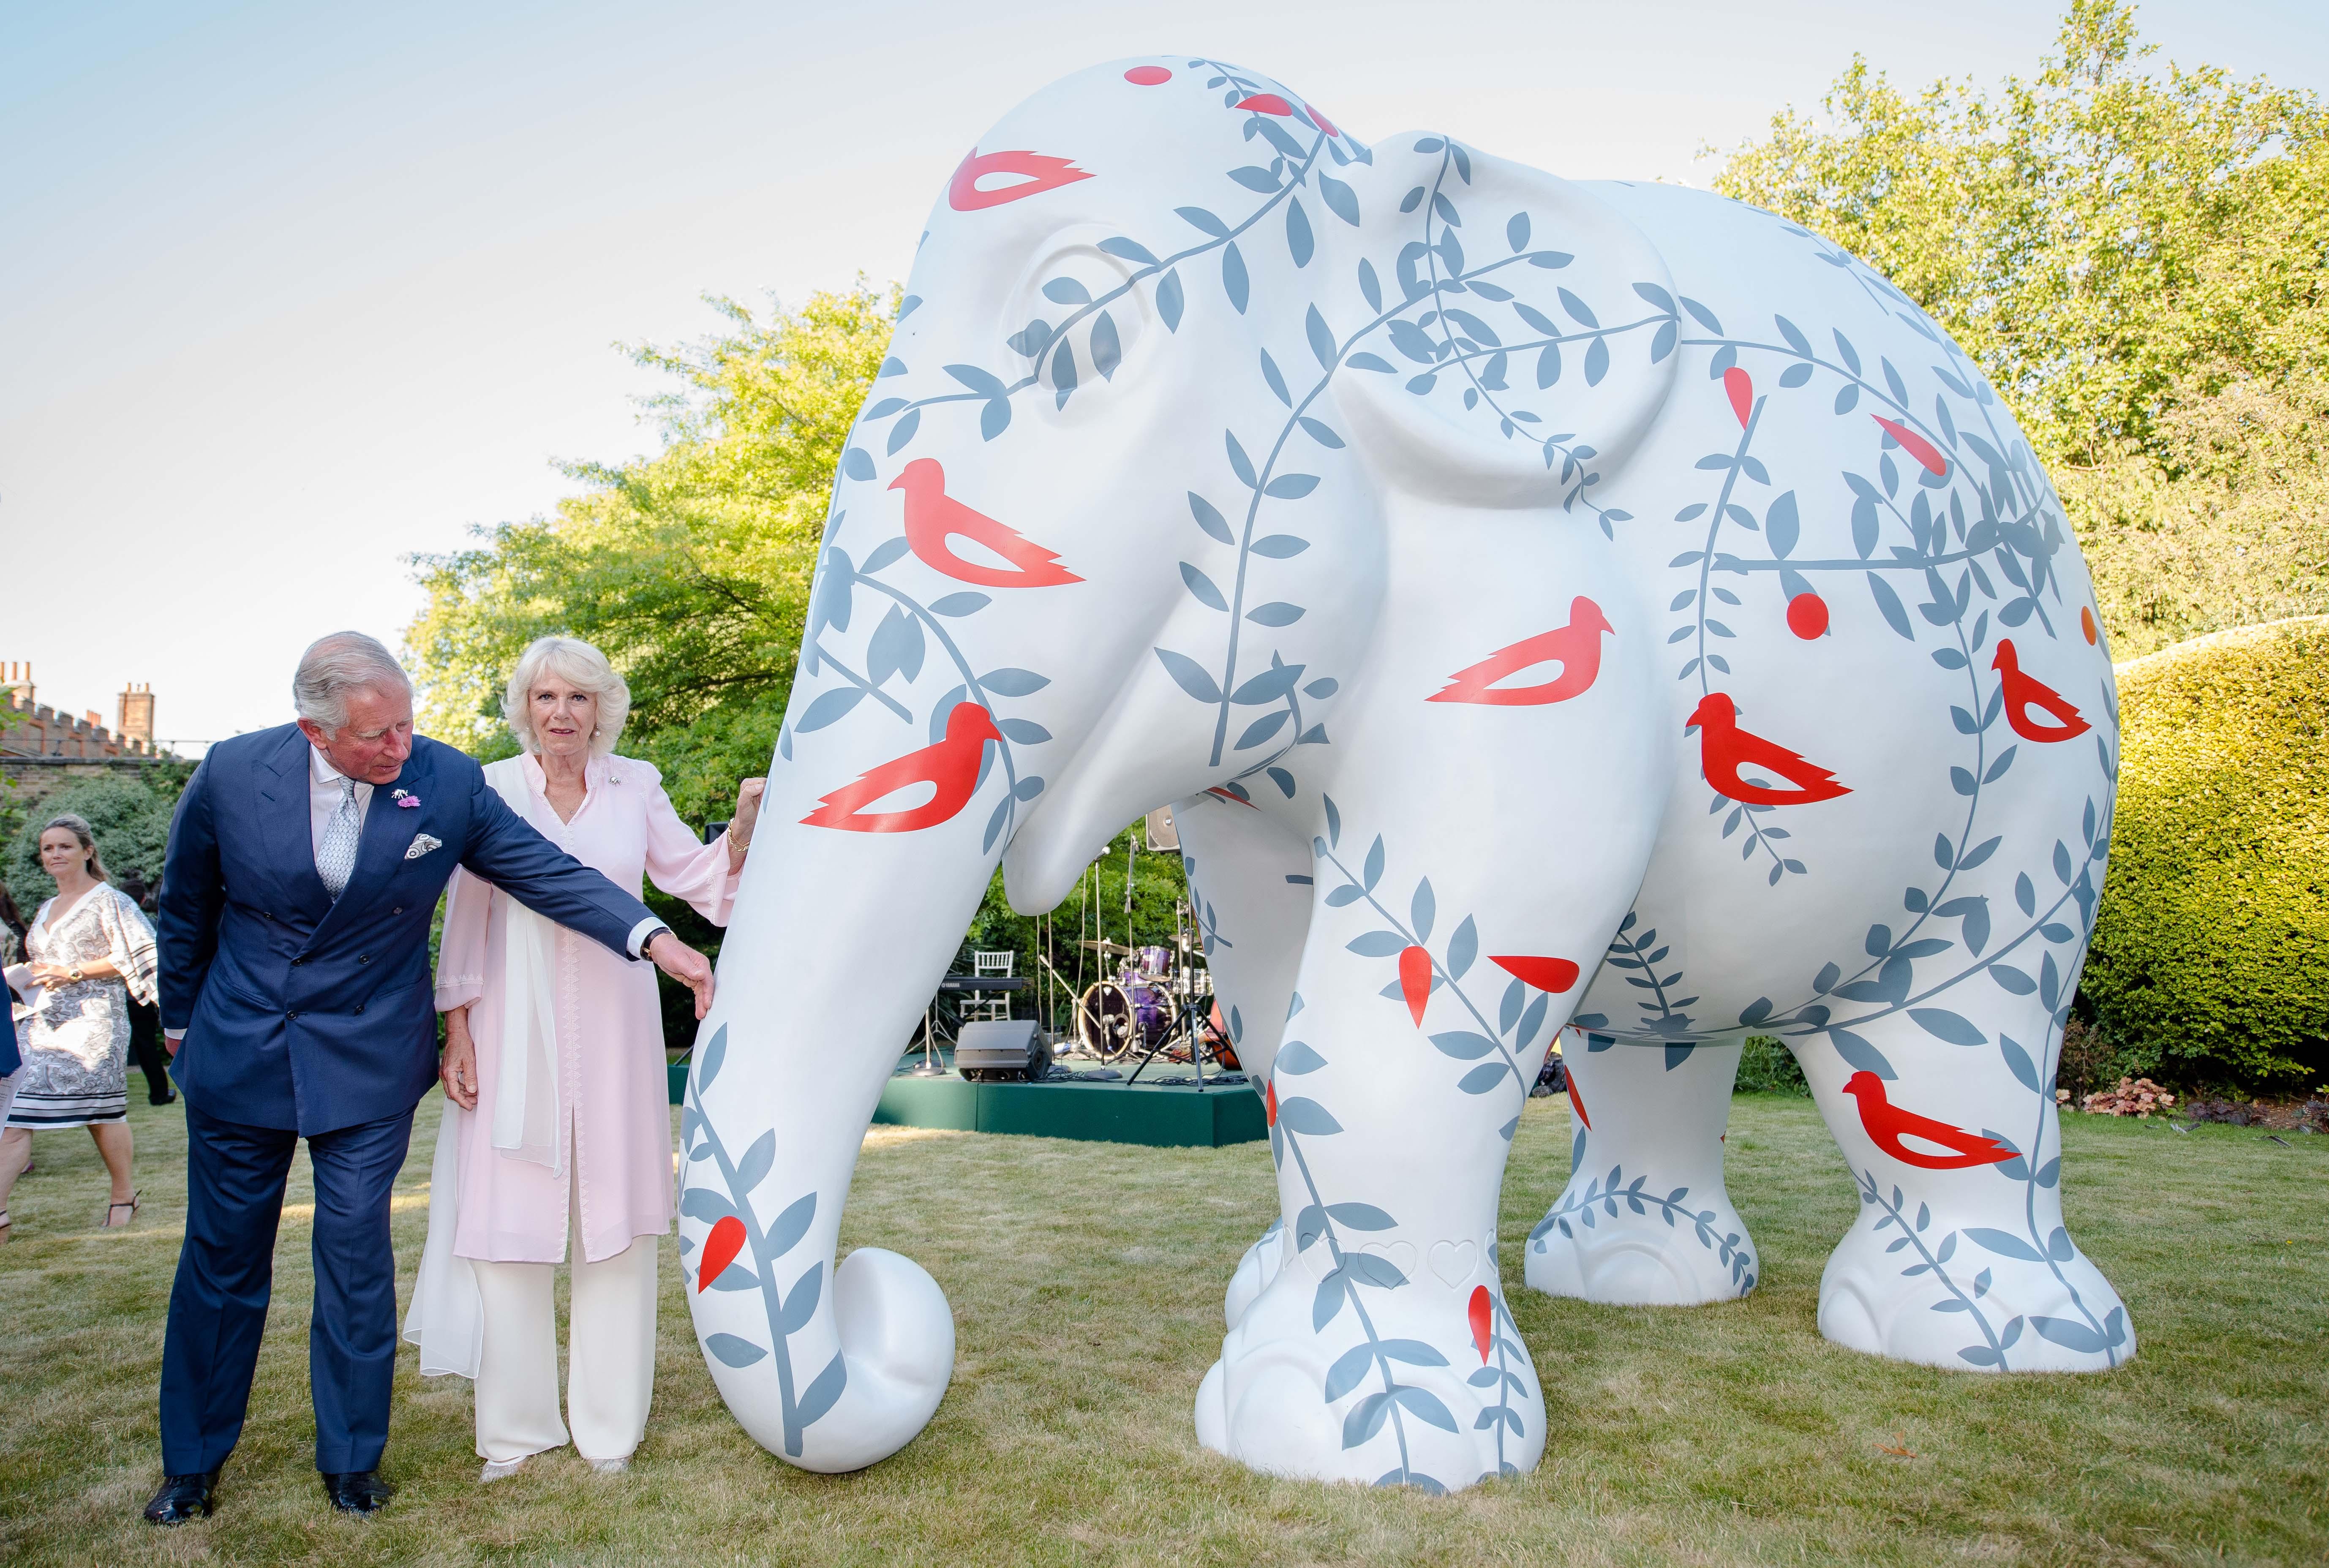 Travels To My Elephant auction, Lancaster House, London, Britain - 30 Jun 2015